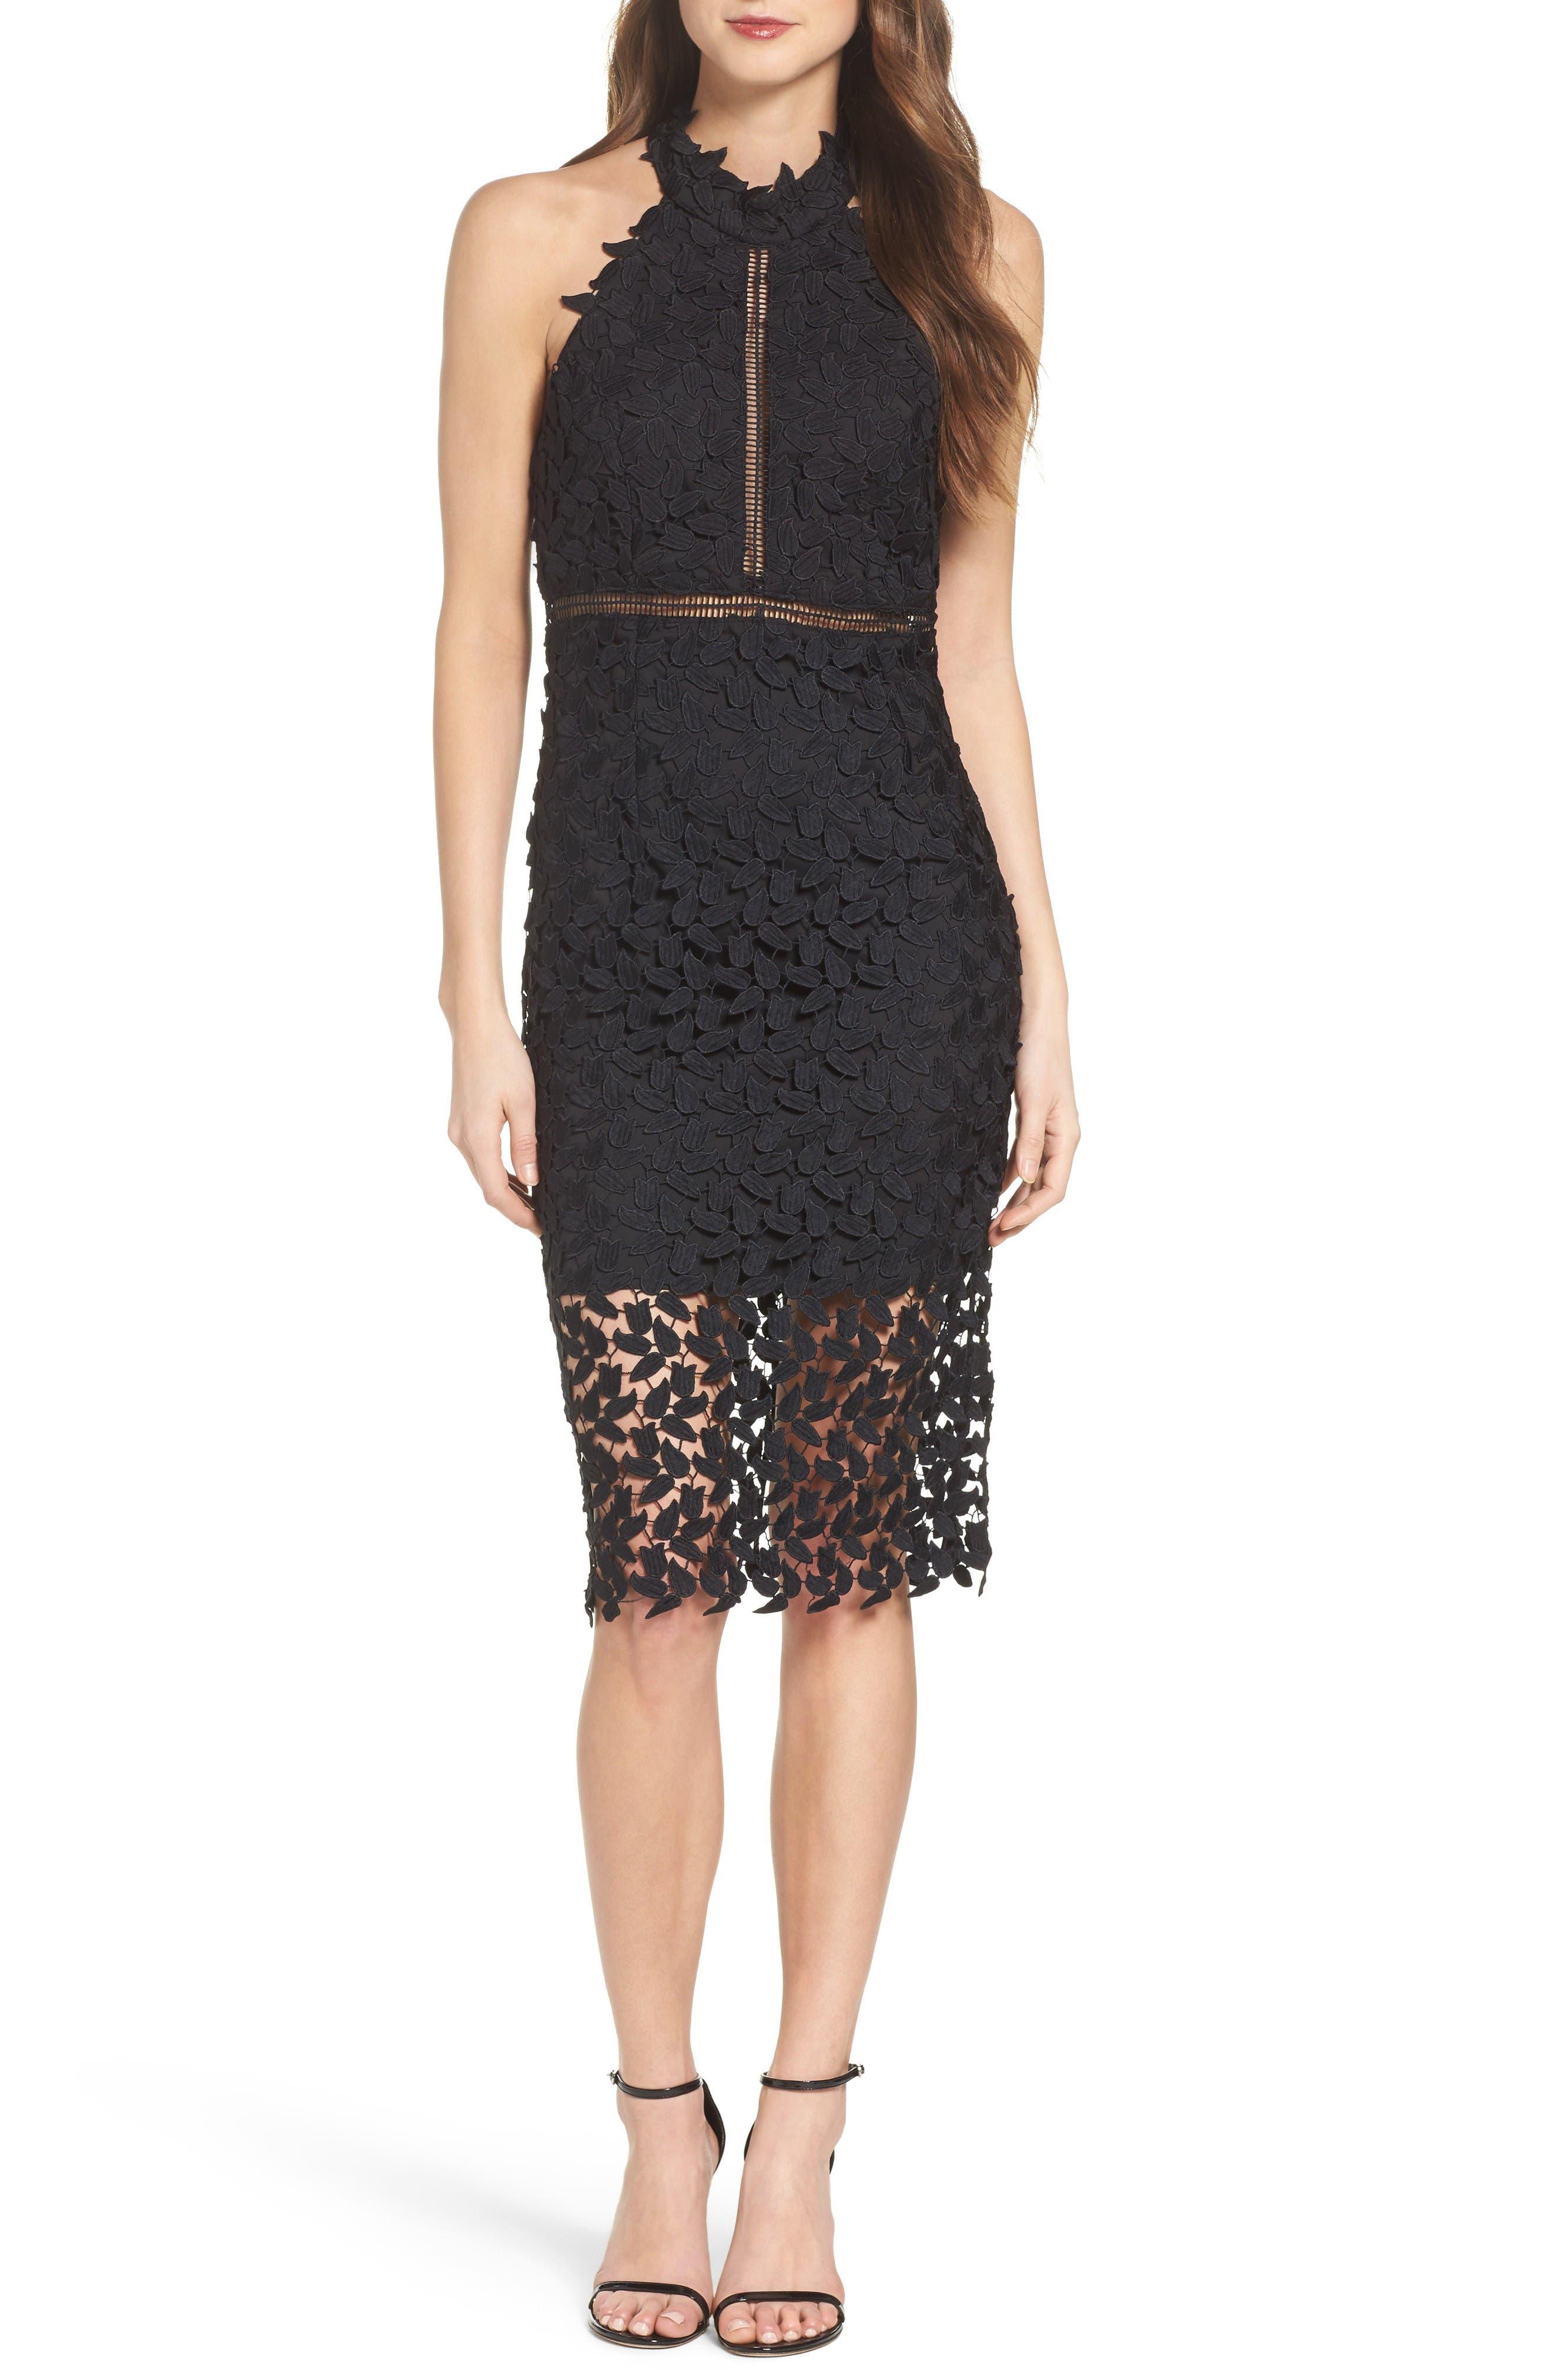 Anne klein dress scalloped lace sheath dress